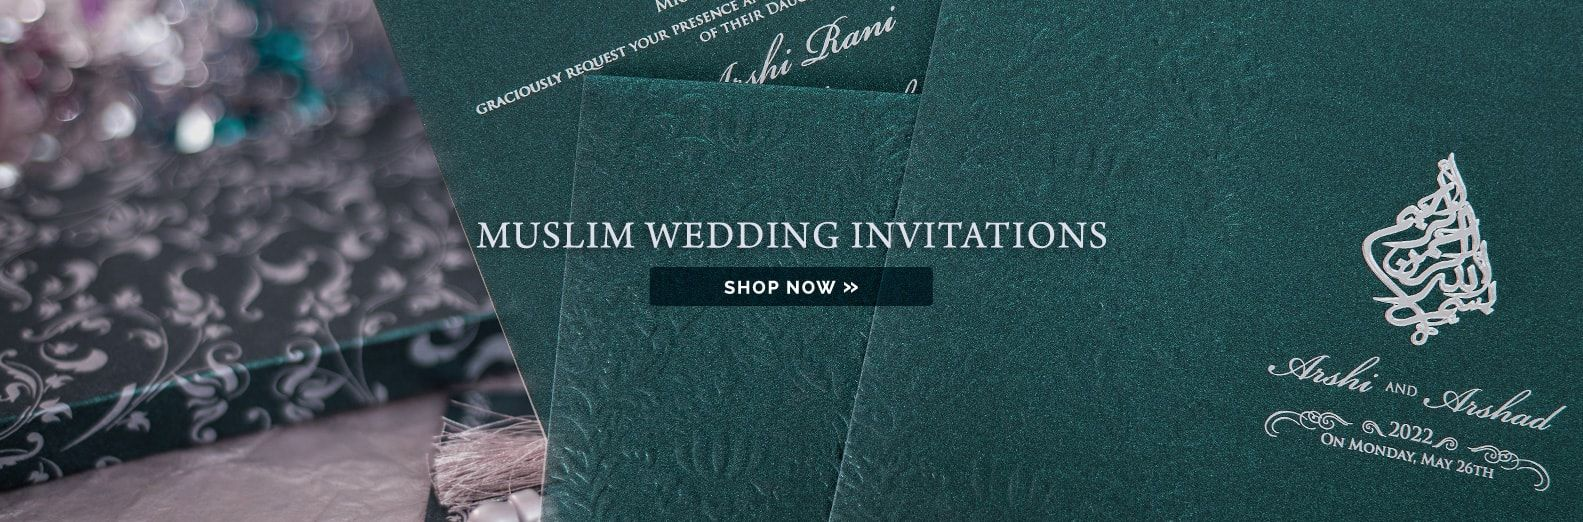 Indian Wedding Cards Indian Wedding Invitations Scroll Invitations